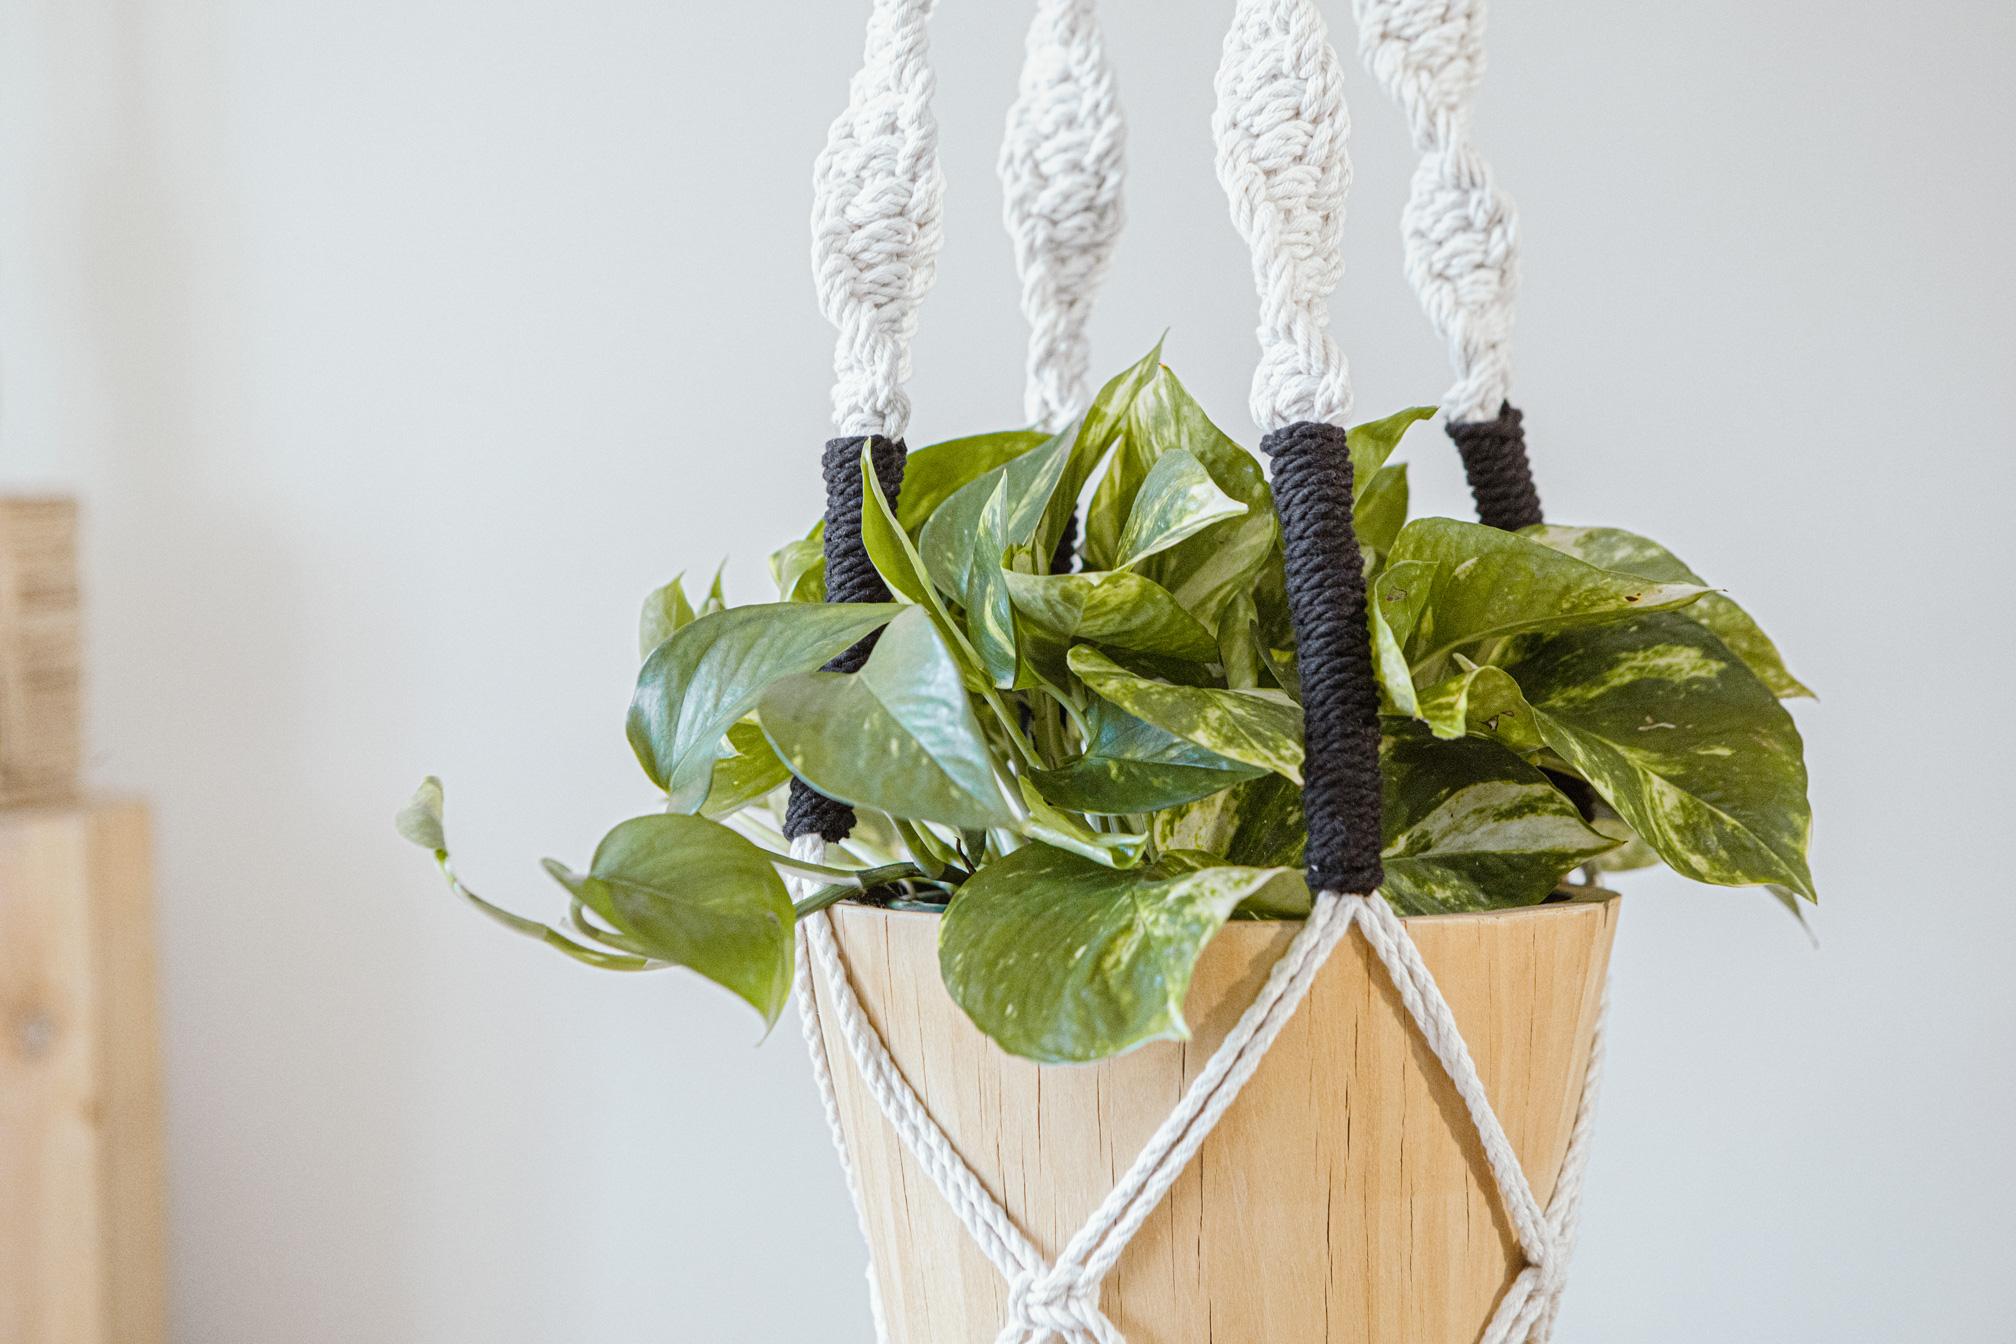 Macetero artesanal de macramé fabricado en algodón ecológico en color crudo con detalles negros